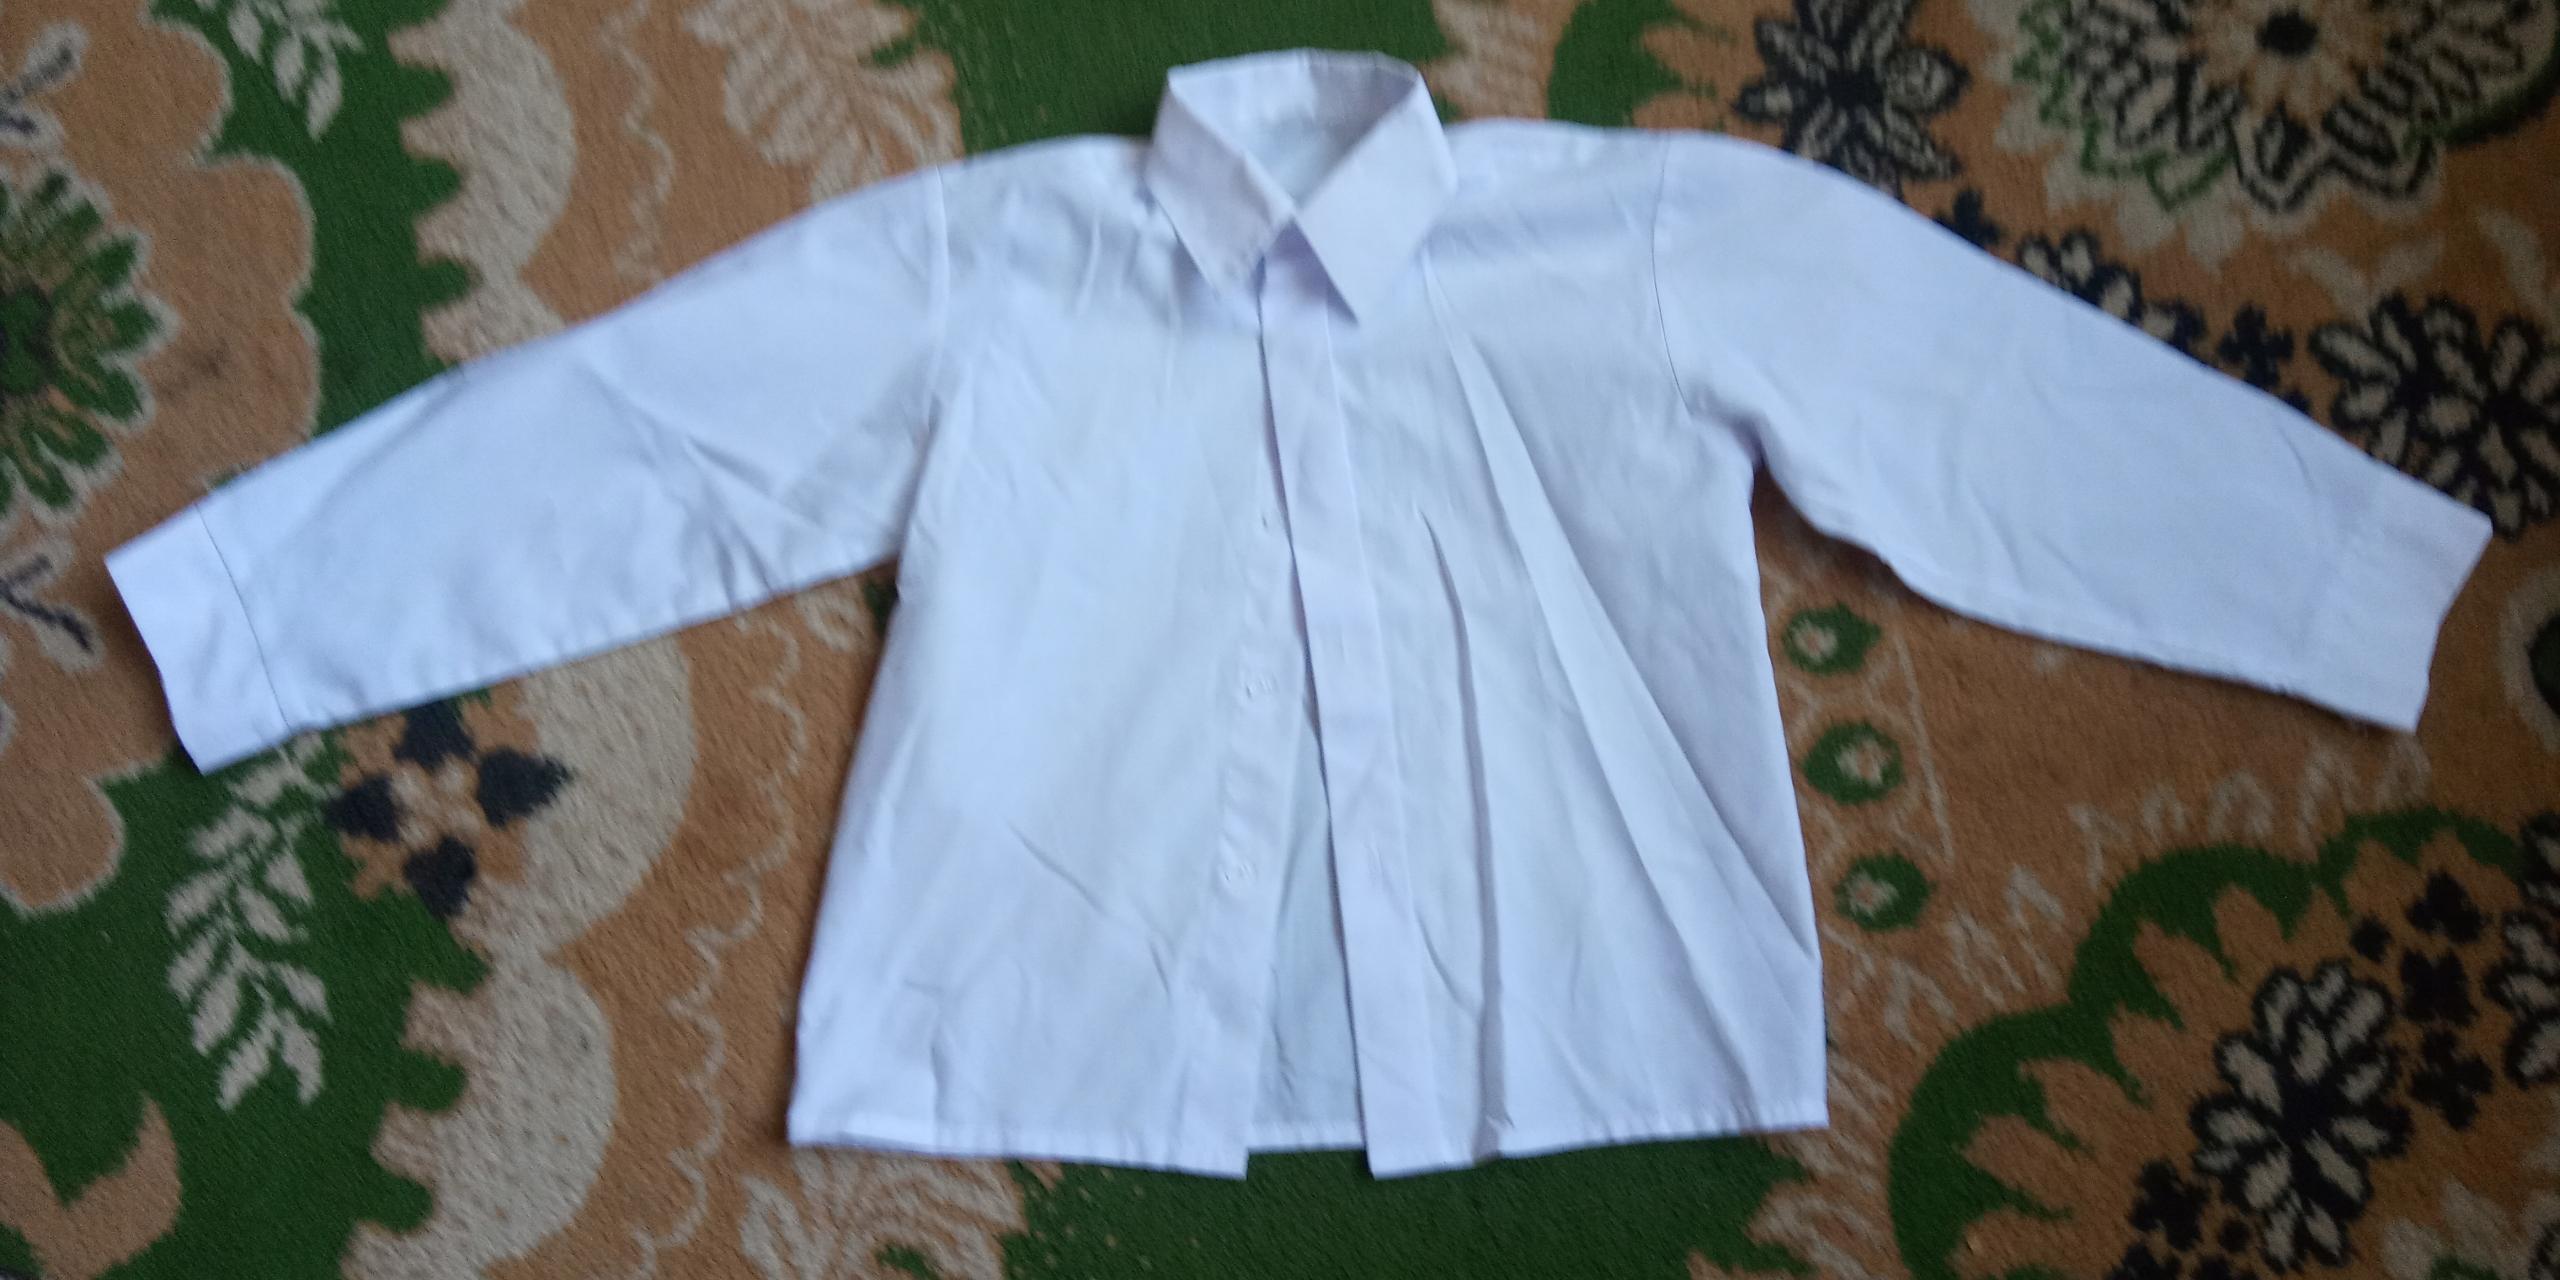 Koszula biała r. 116 chłopak 5-6 lat